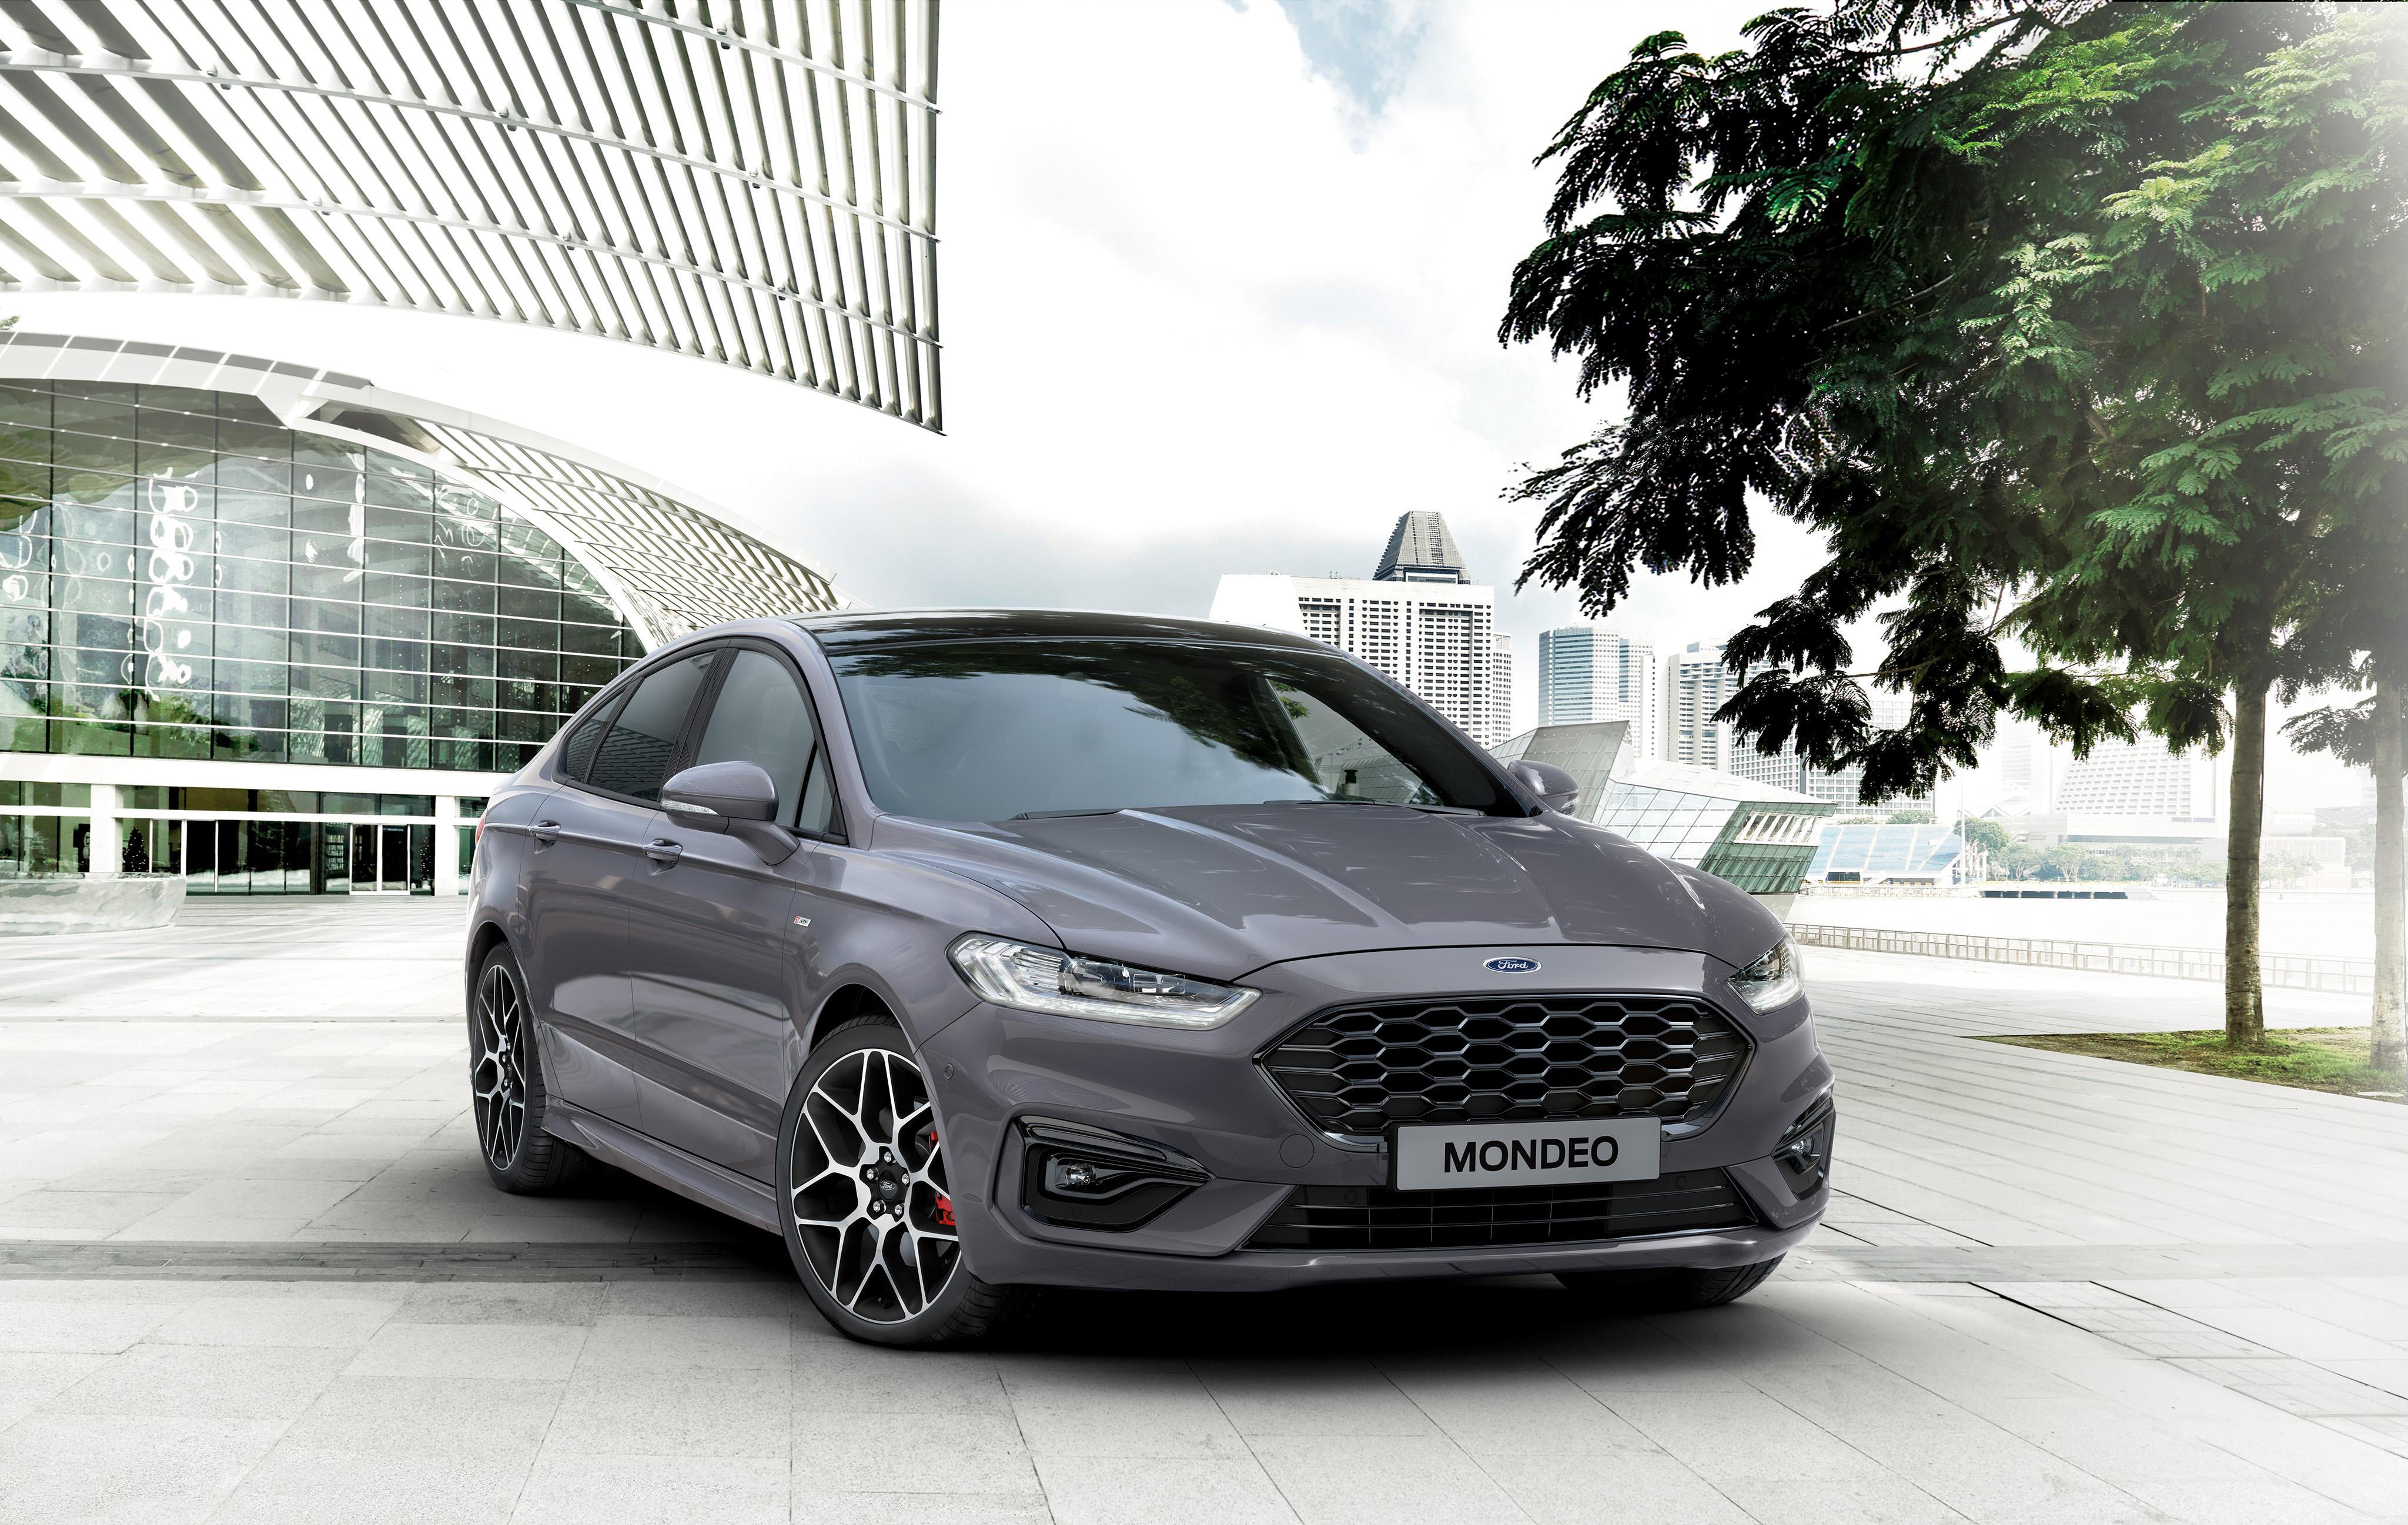 Форд Мондео 2019 в новом кузове фото, цена, видео, характеристики Ford Mondeo